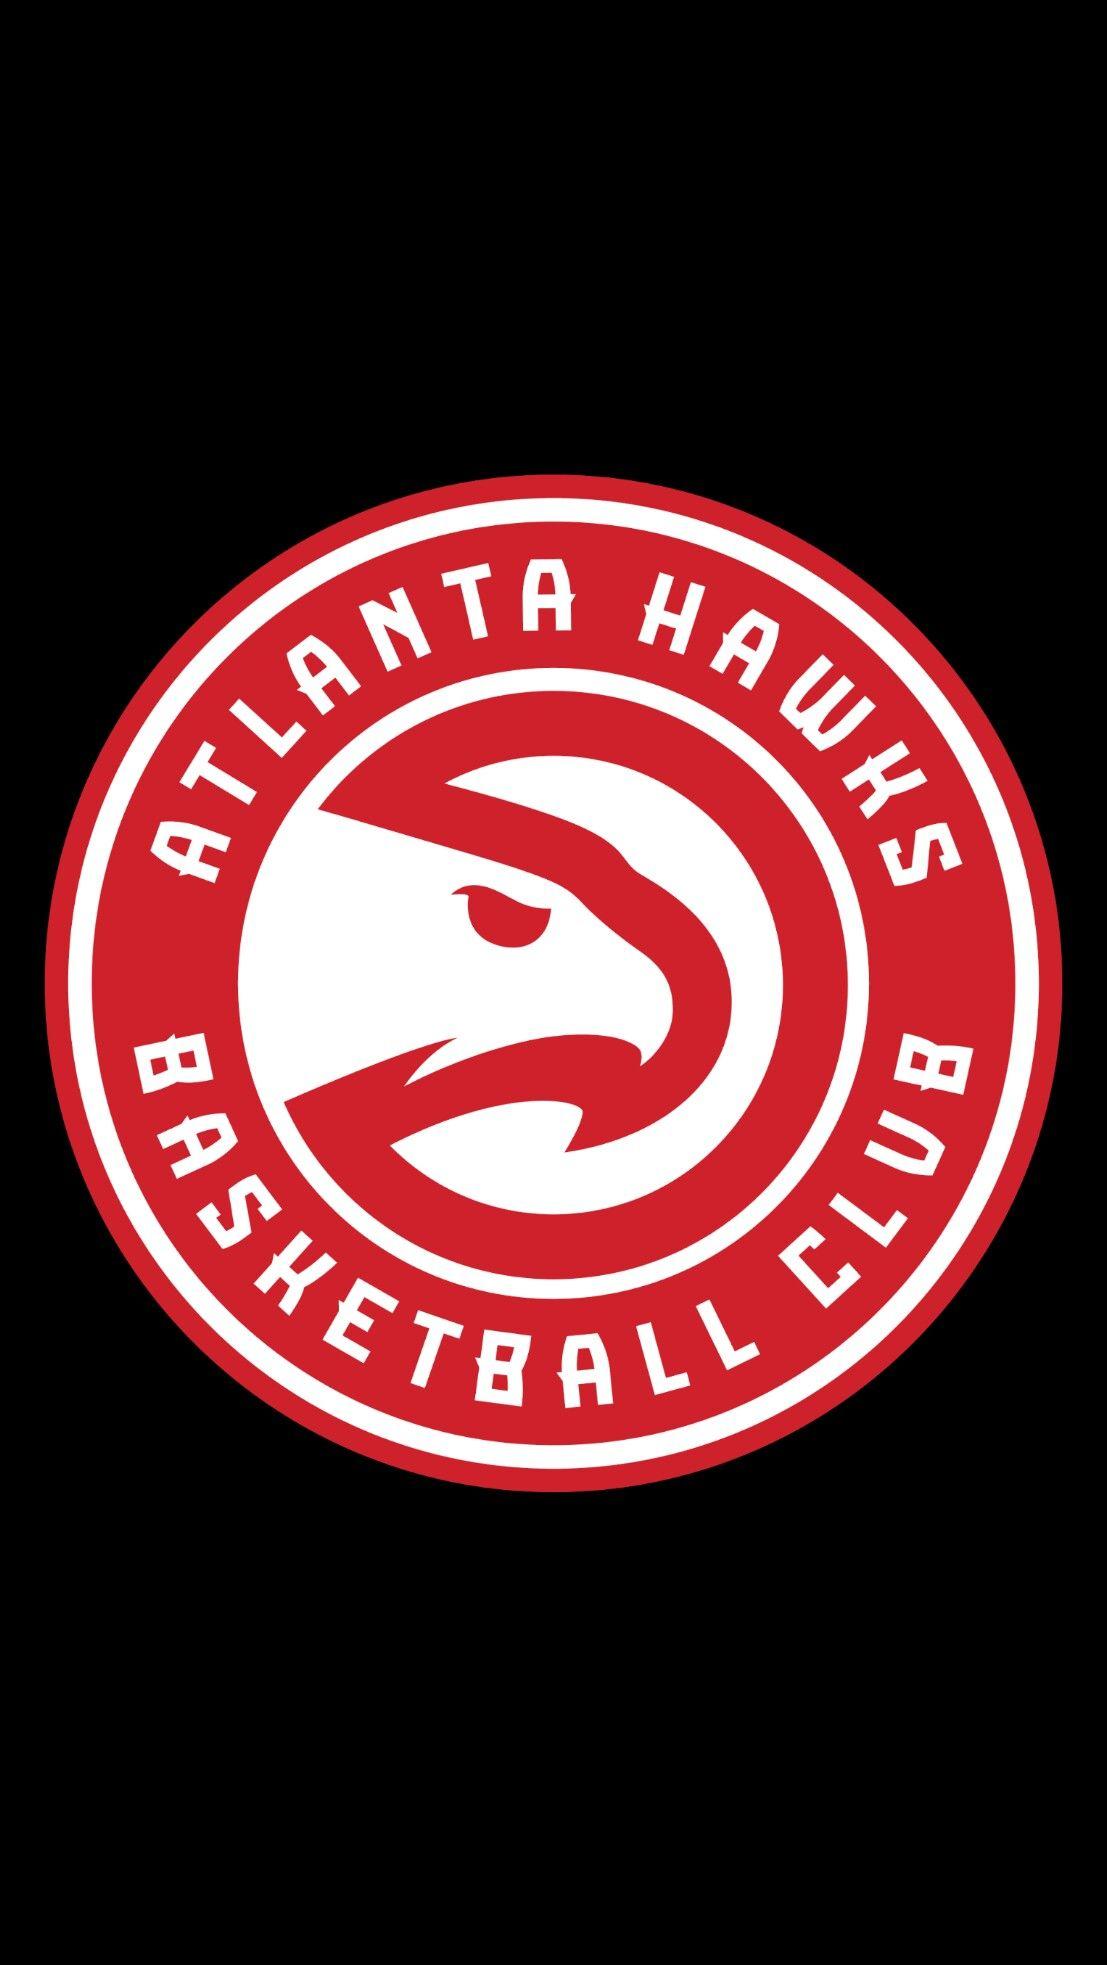 nba wallpaper iphone android Atlanta hawks, Sports